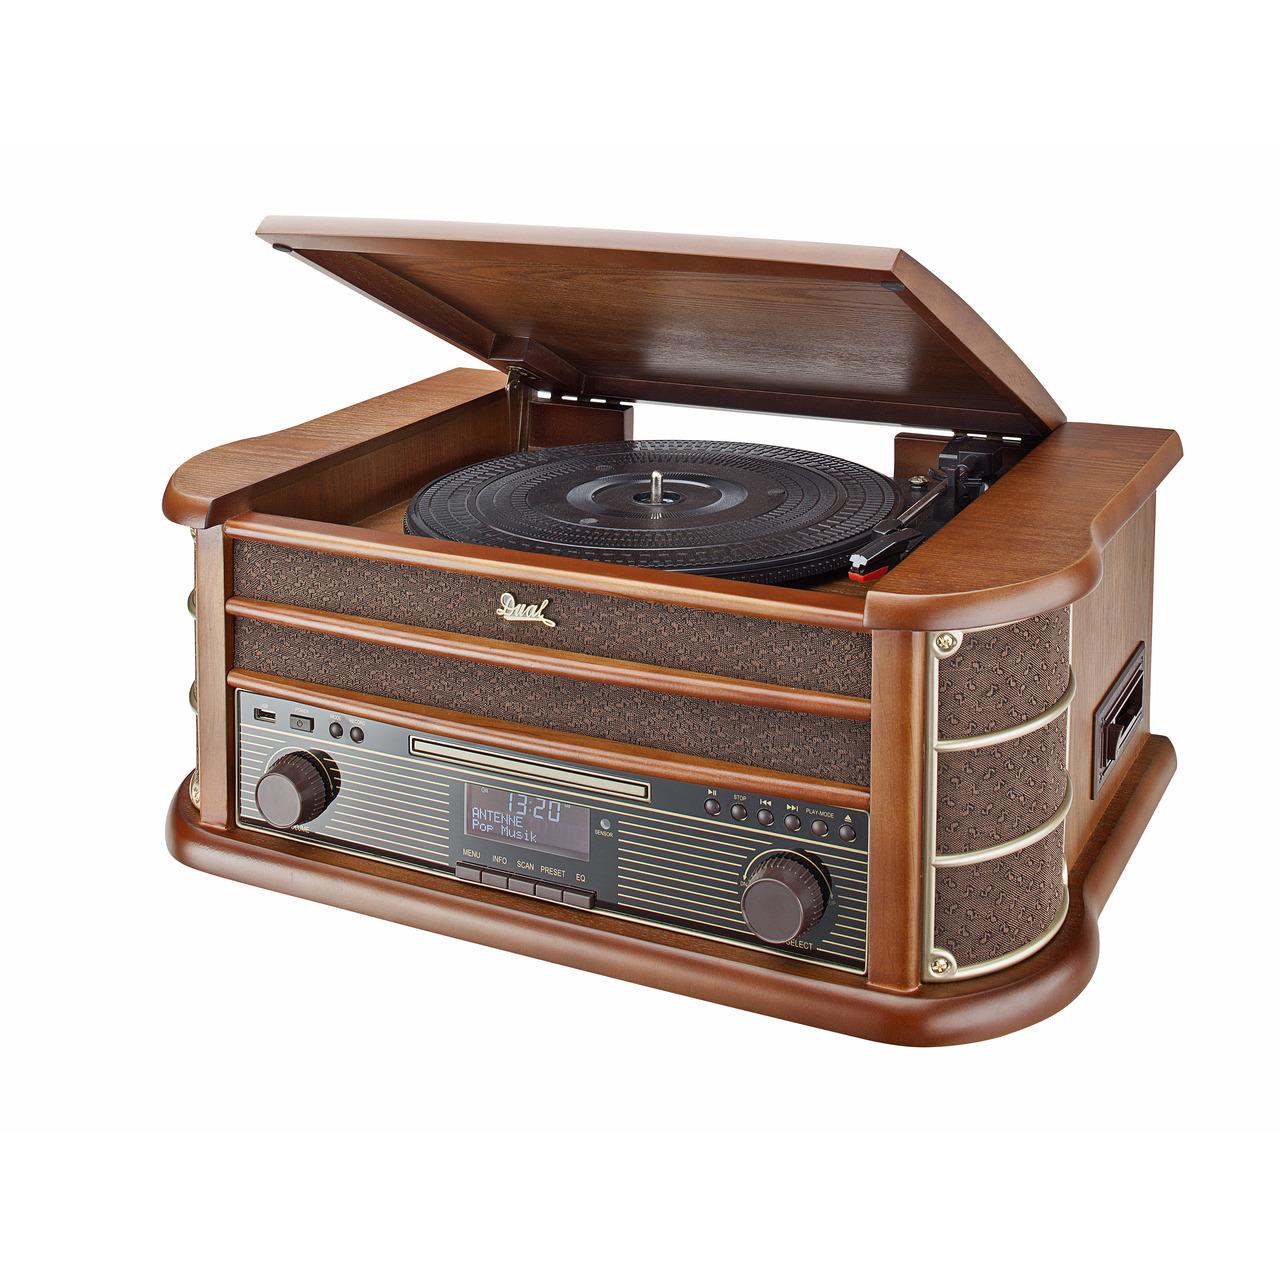 Dual Nostalgie-Stereo-Musikcenter NR 50 DAB- UKW/DAB+- USB- CD-Player- Kassettenlaufwerk